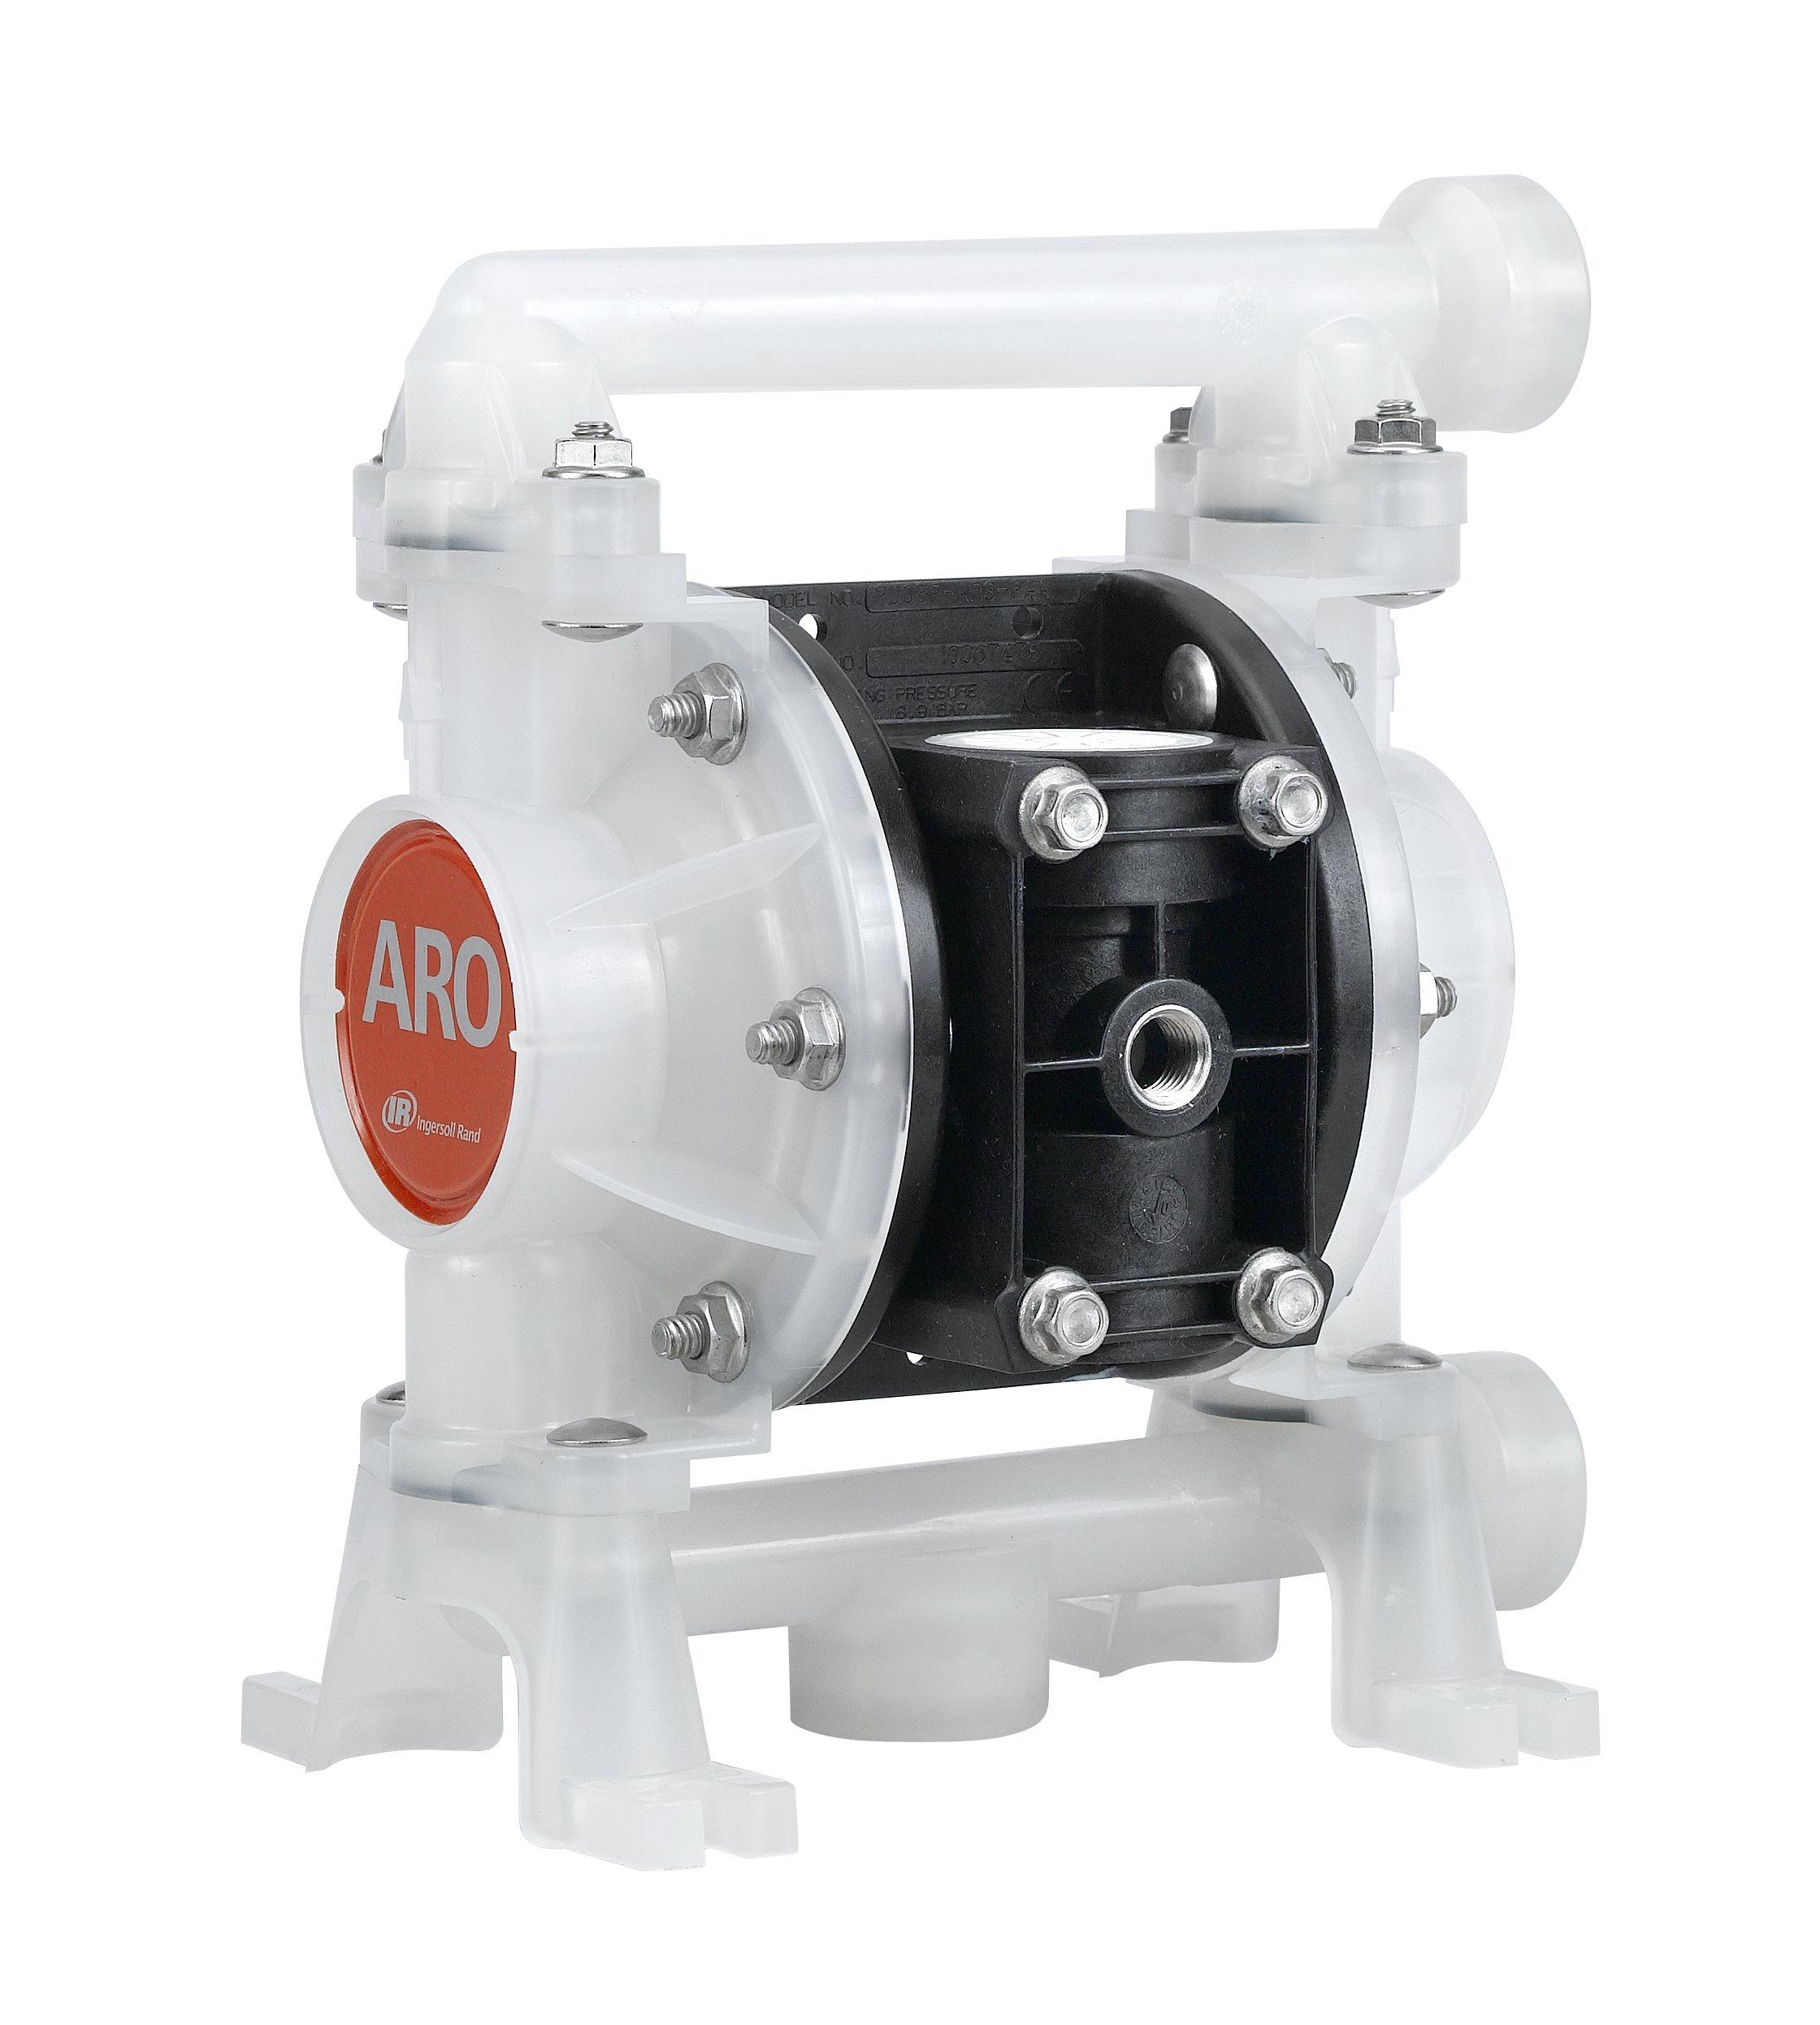 ARO PD03P-APS-PTT Polypropylene PTFE Single Double Diaphragm Pump, 10.6 gpm, 100 psi